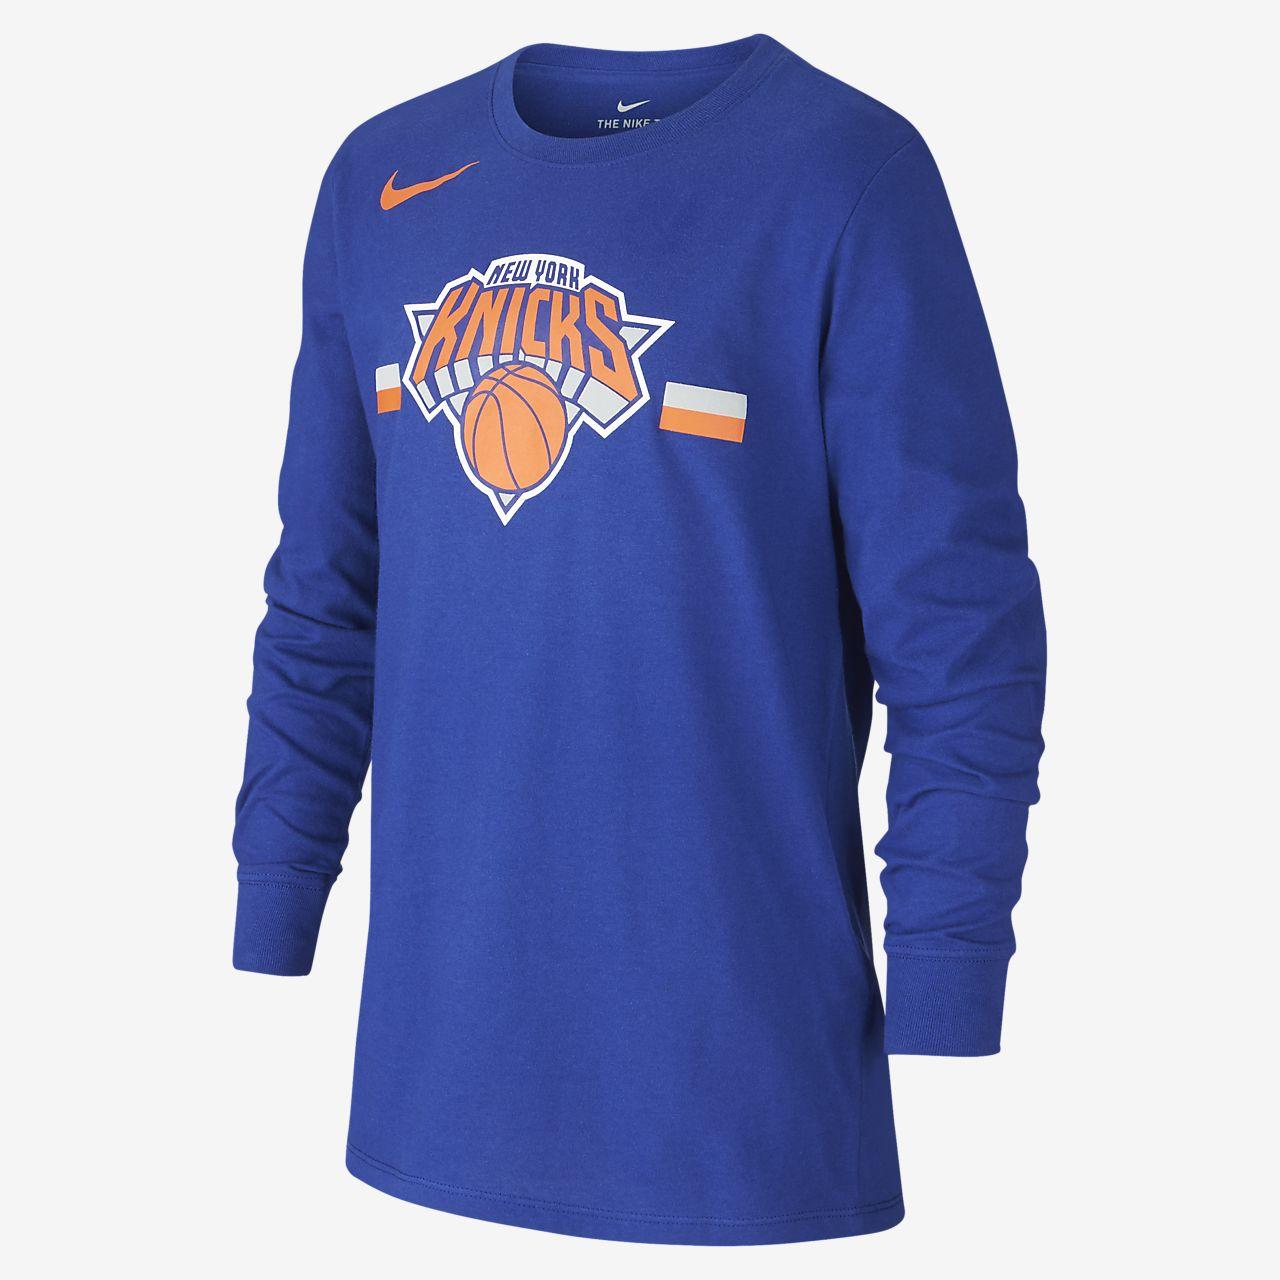 Camisola NBA de manga comprida New York Knicks Nike Dri-FIT Logo Júnior